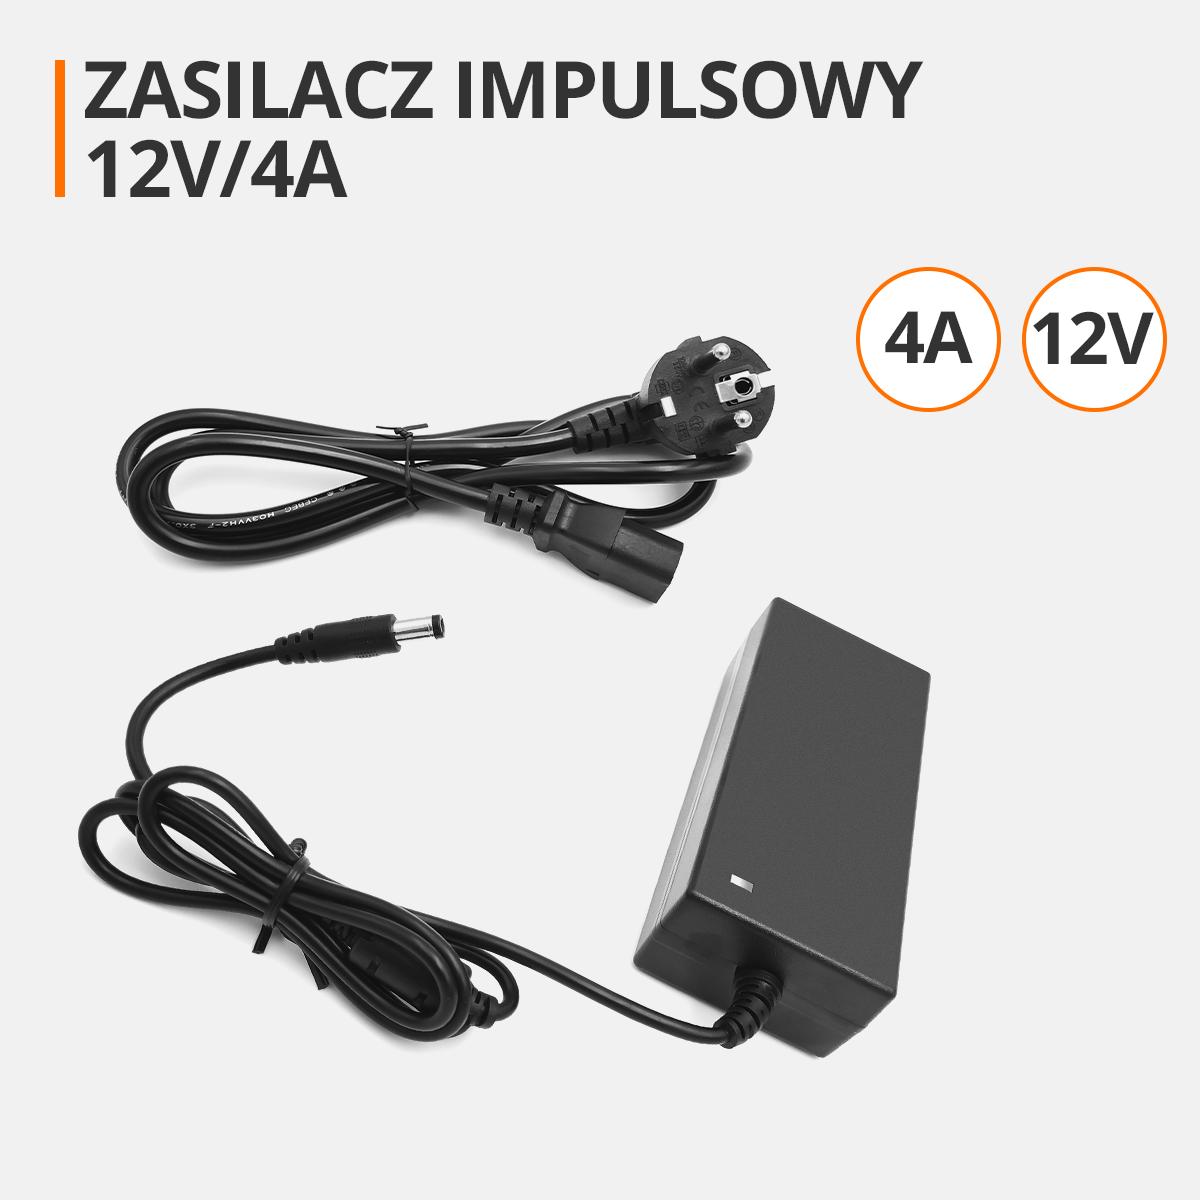 zasilacz-sieciowy-12v-orllo-pl